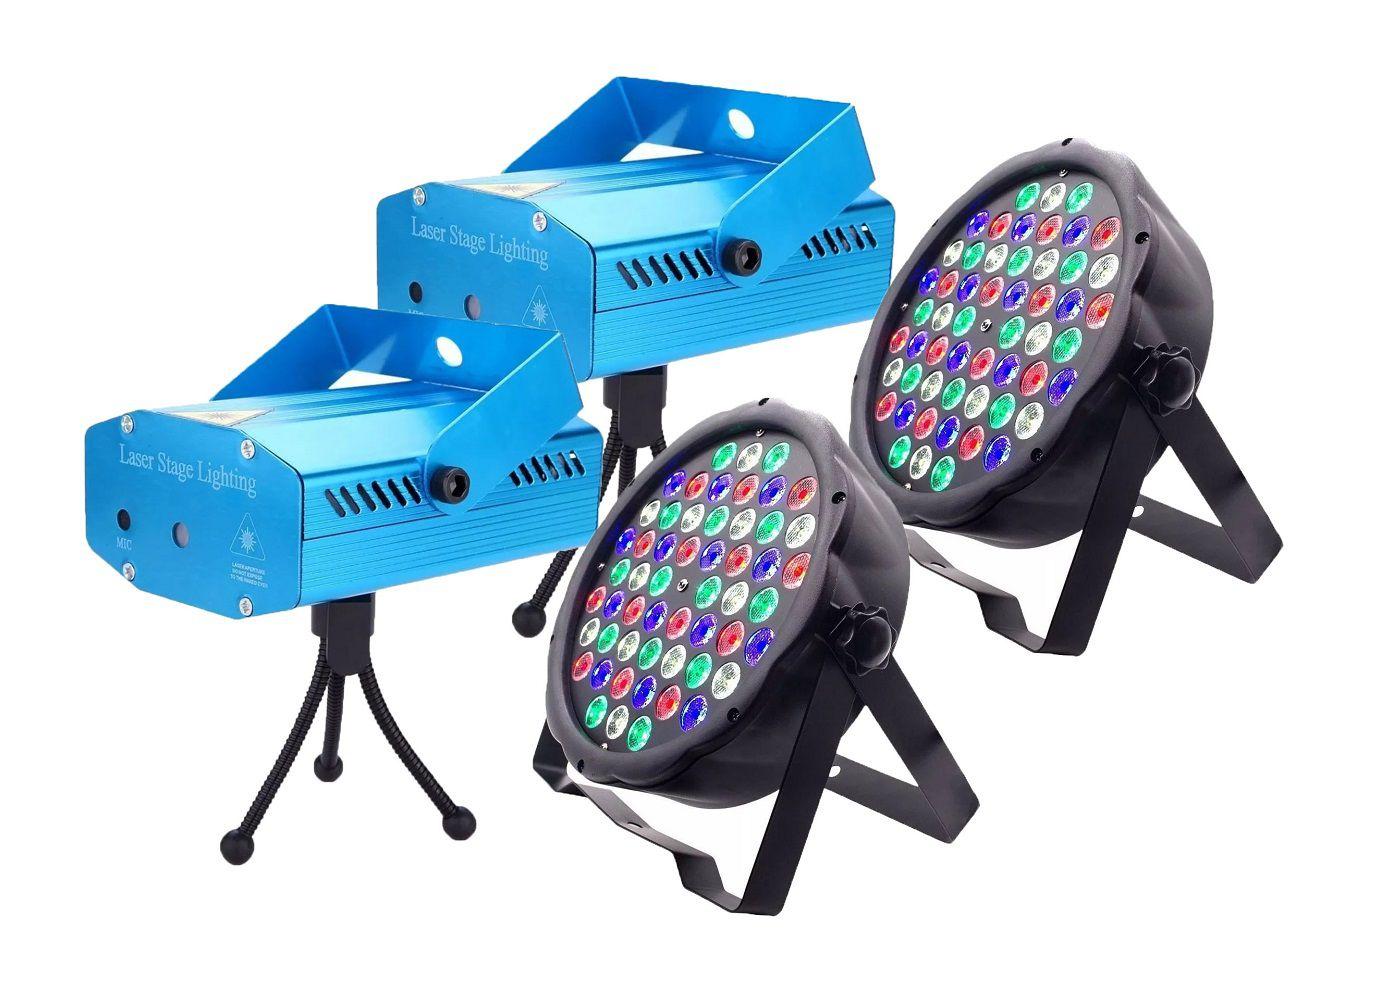 Kit 2x Canhão Luz Par 54 LEDs + 2x Mini Laser Projetor Holográfico - 54LEDSLIM+SD-09